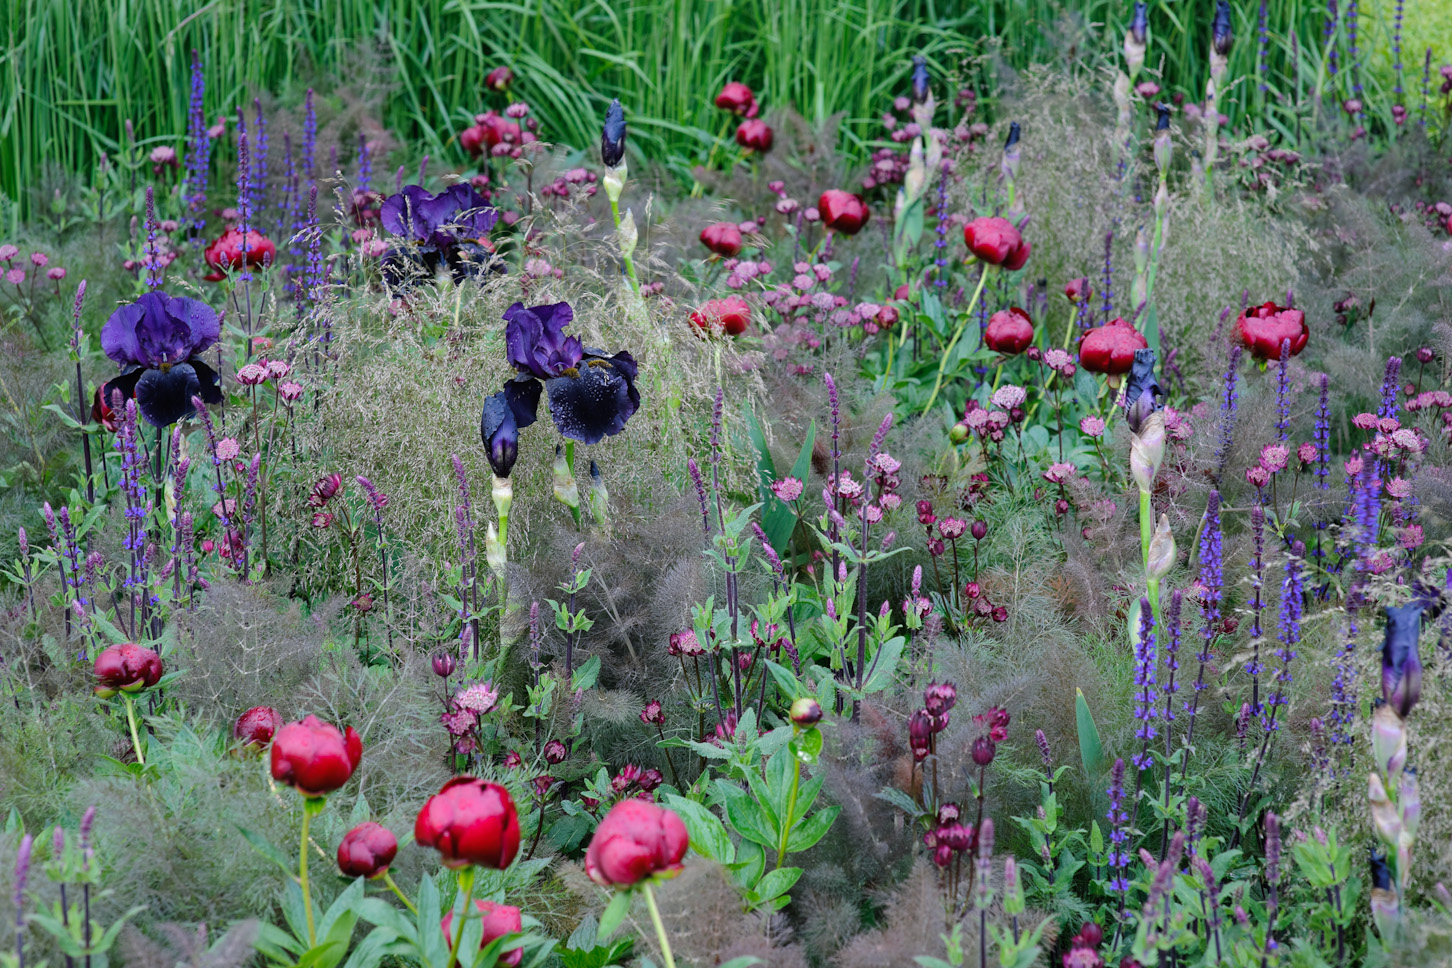 Better Homes And Gardens Magazine >> BBC Gardeners' World Photography   Jason Ingram   Bristol Photographer of Garden, Gardens